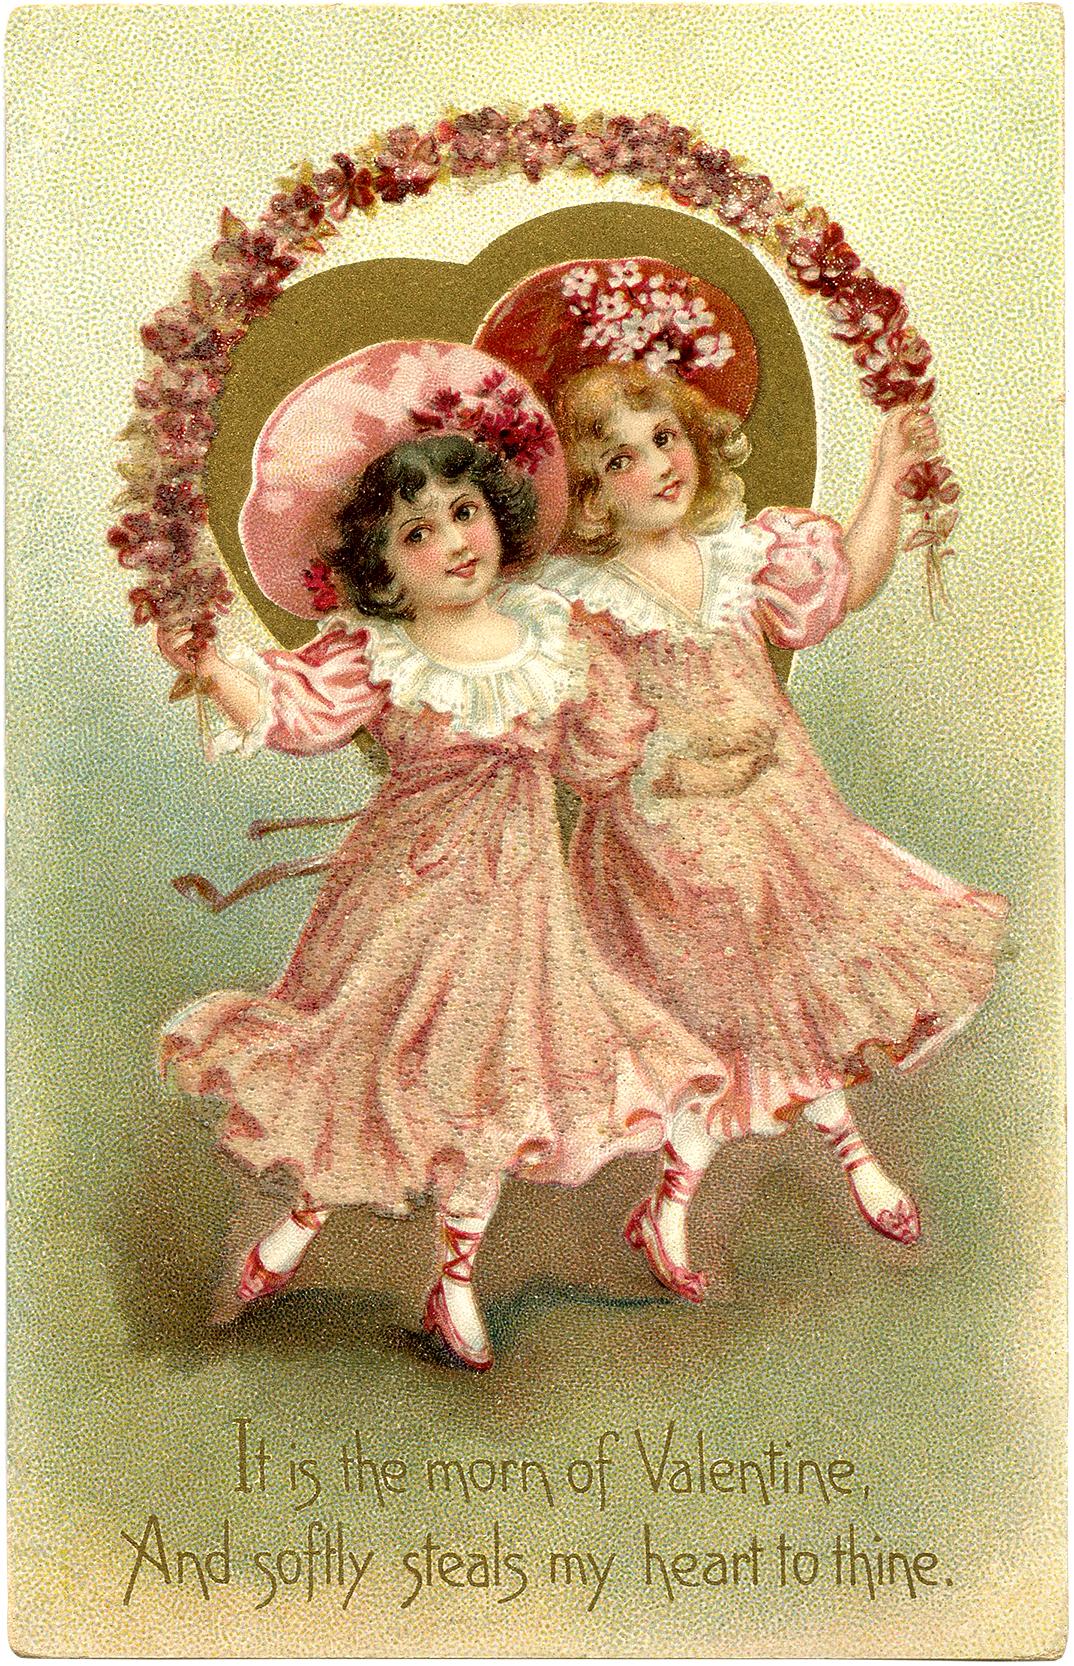 Free Vintage Valentine Image The Graphics Fairy – Vintage Victorian Valentine Cards